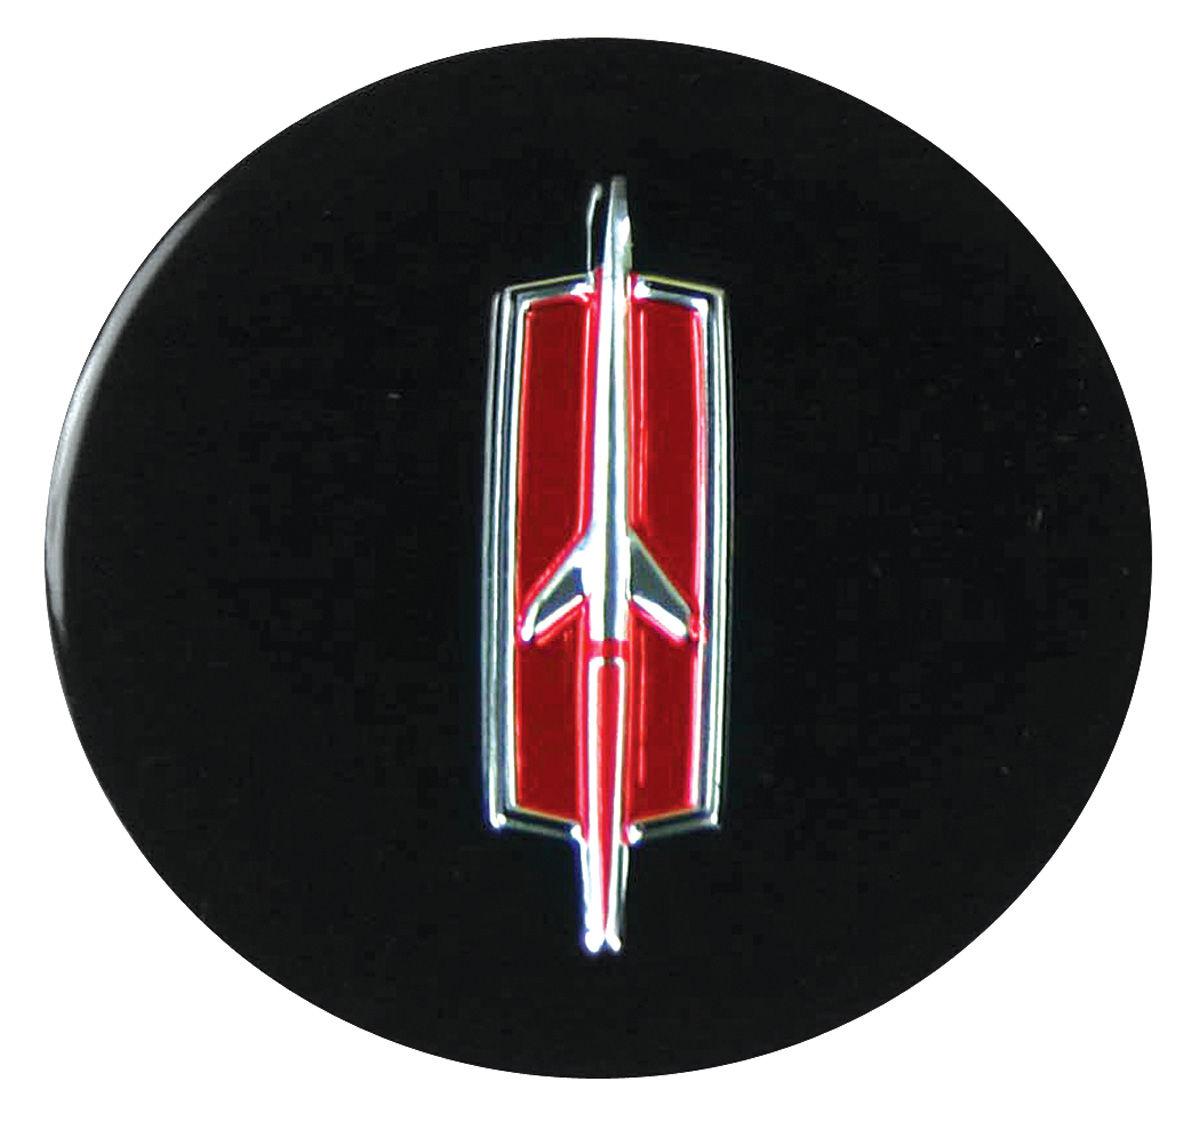 Decal, SSI Wheel, 1966-72 Cutlass